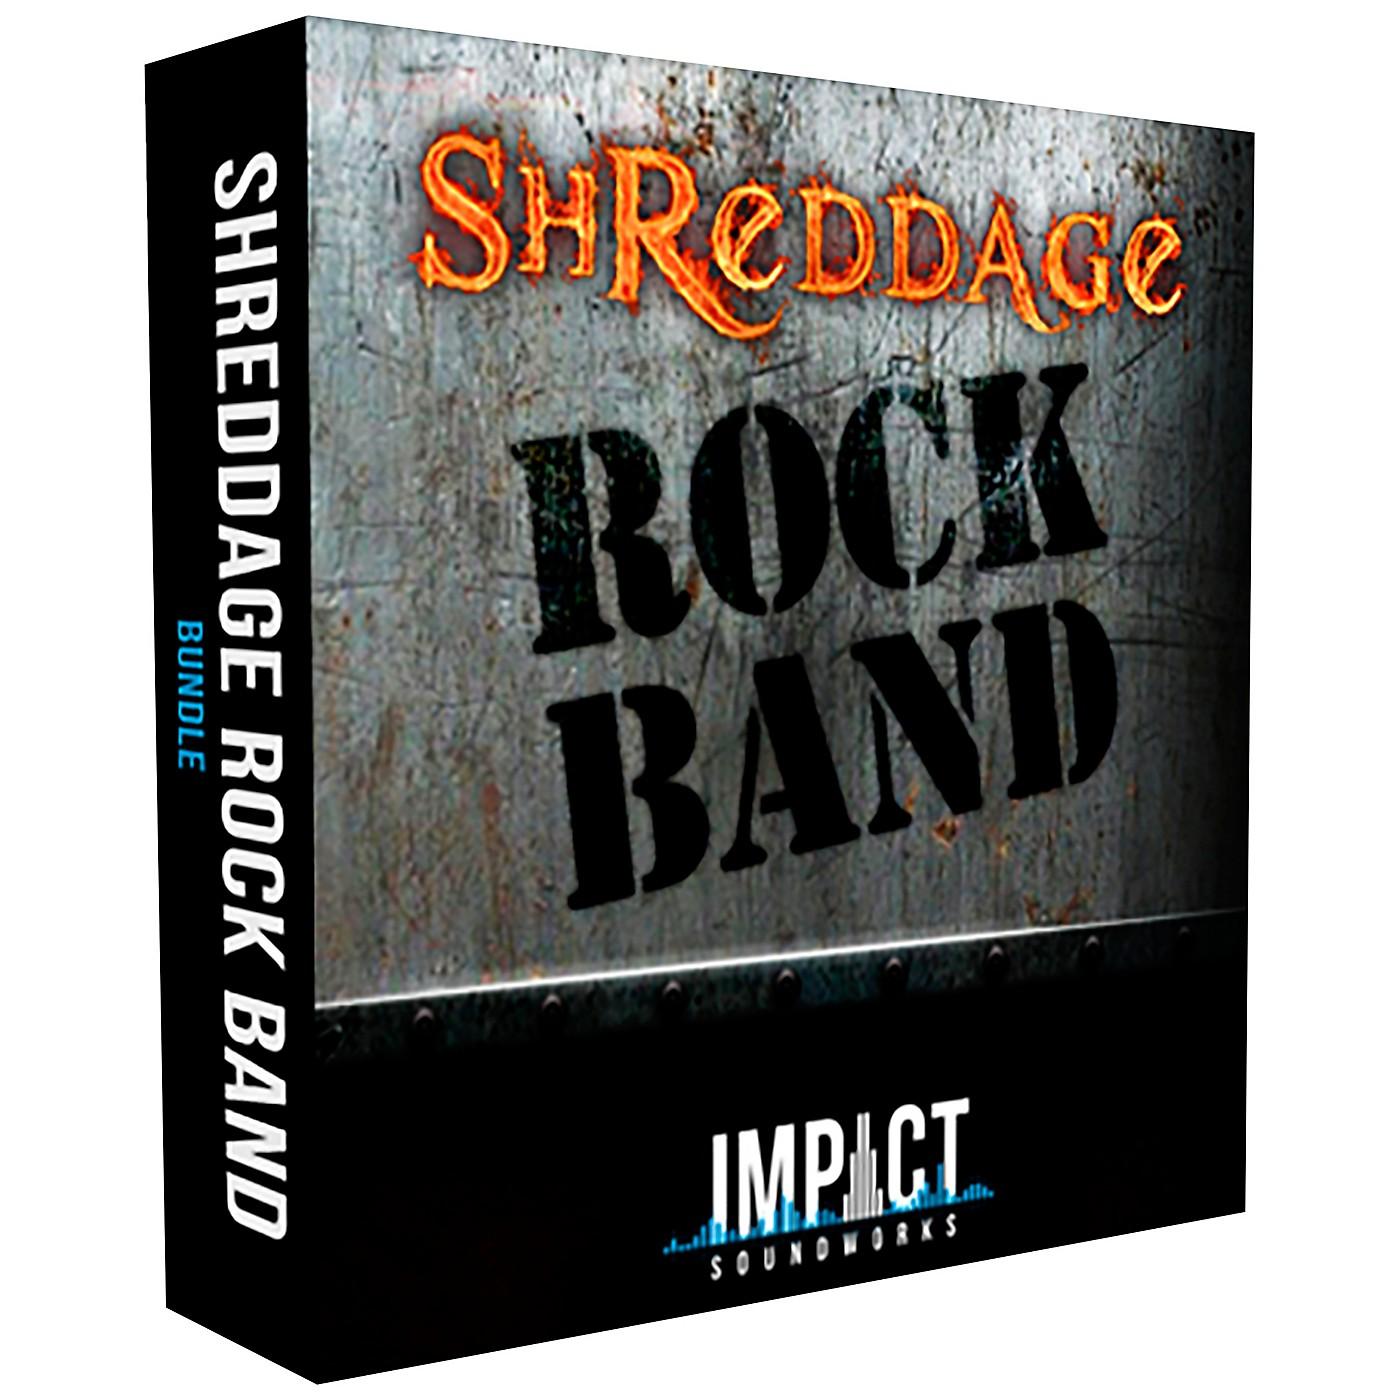 Impact Soundworks Shreddage 3 Rock Band (Download) thumbnail